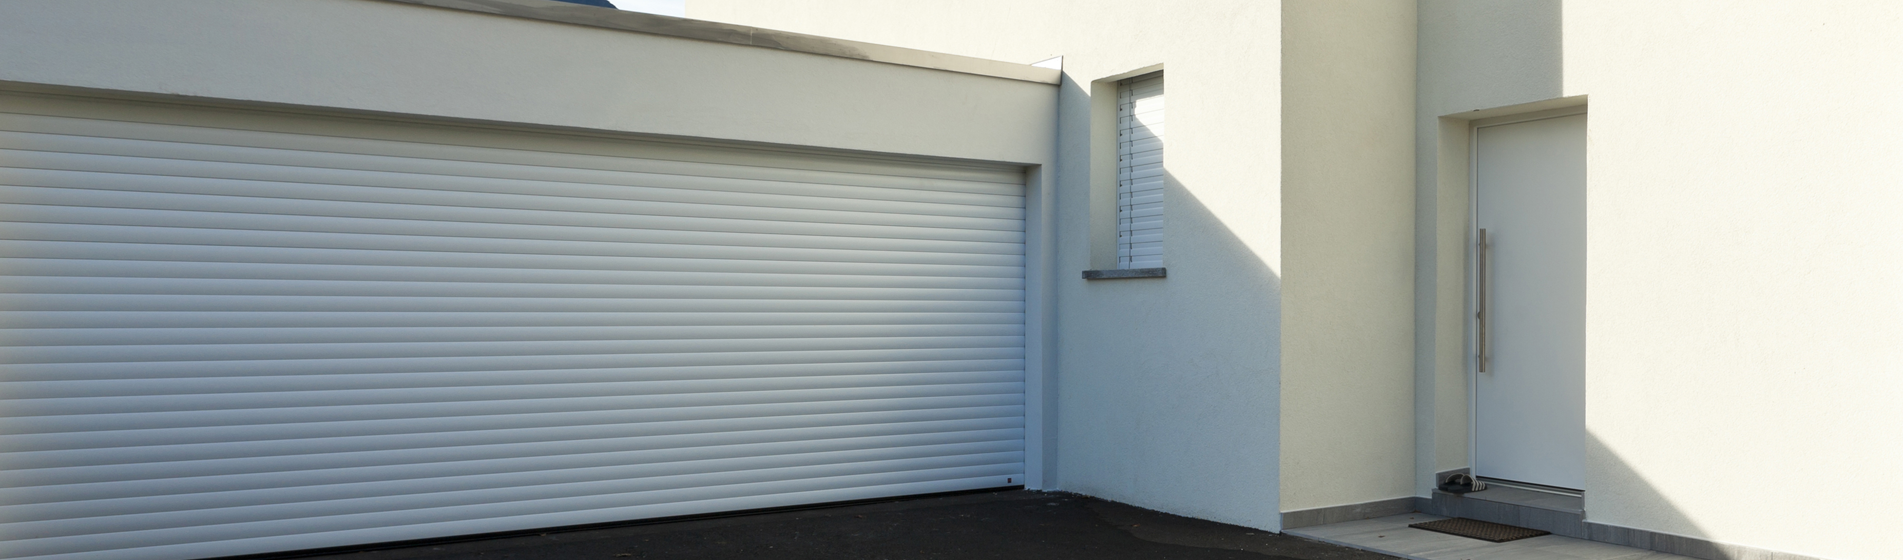 fabricant porte de garage sectionelle 84000